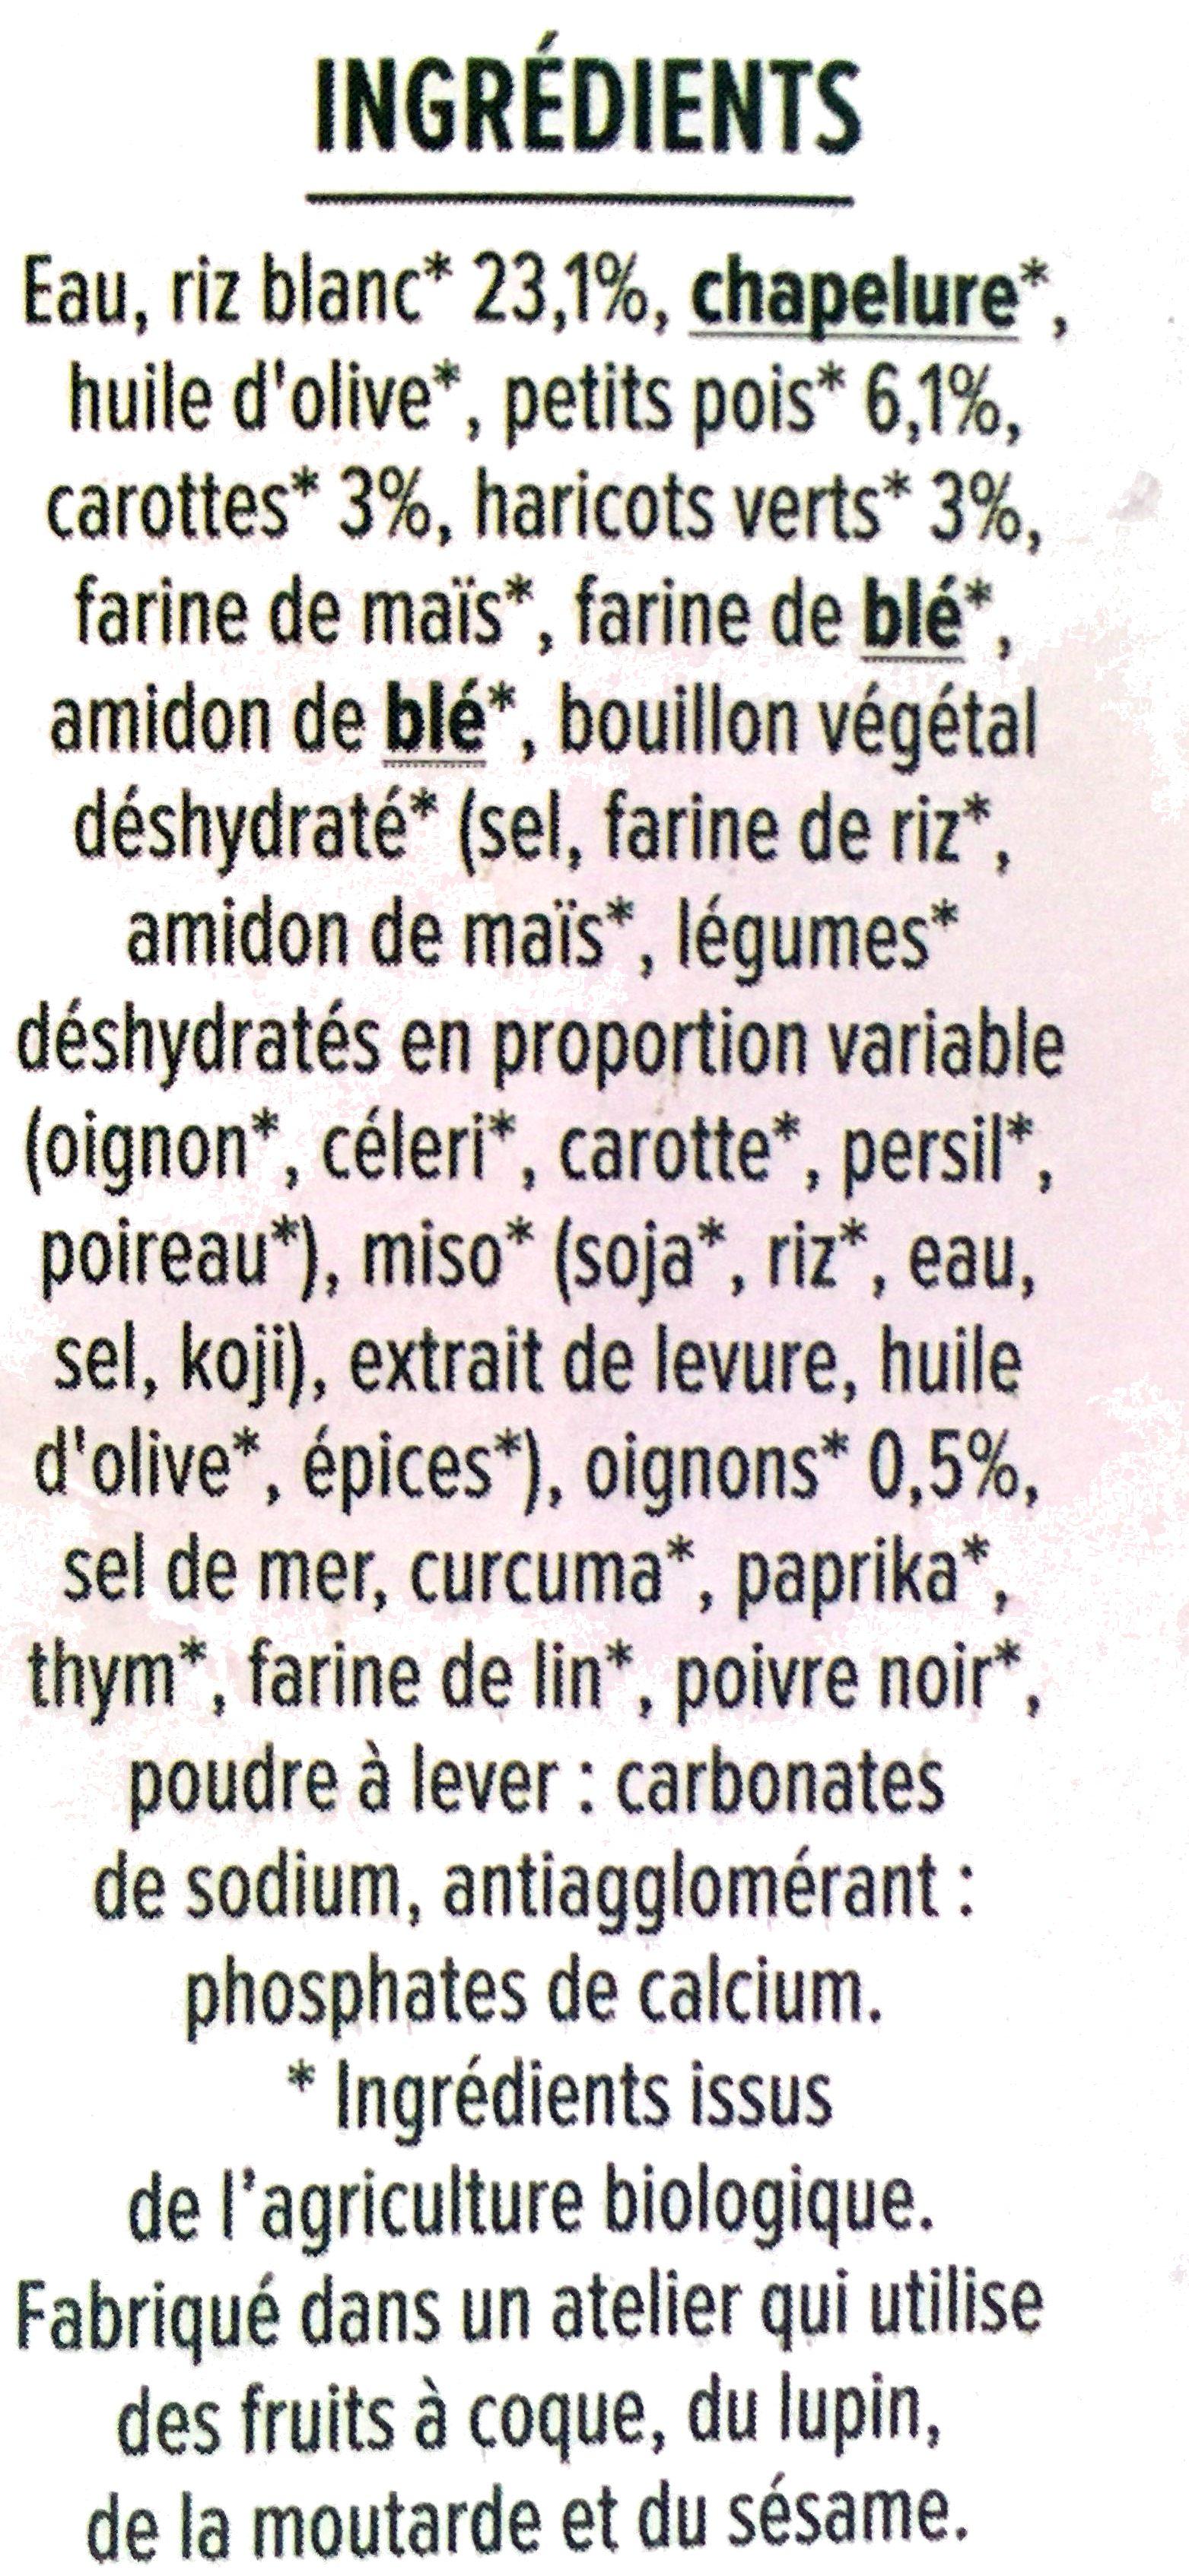 Bouchées moelleuses Riz Petits Légumes - Ingredients - fr